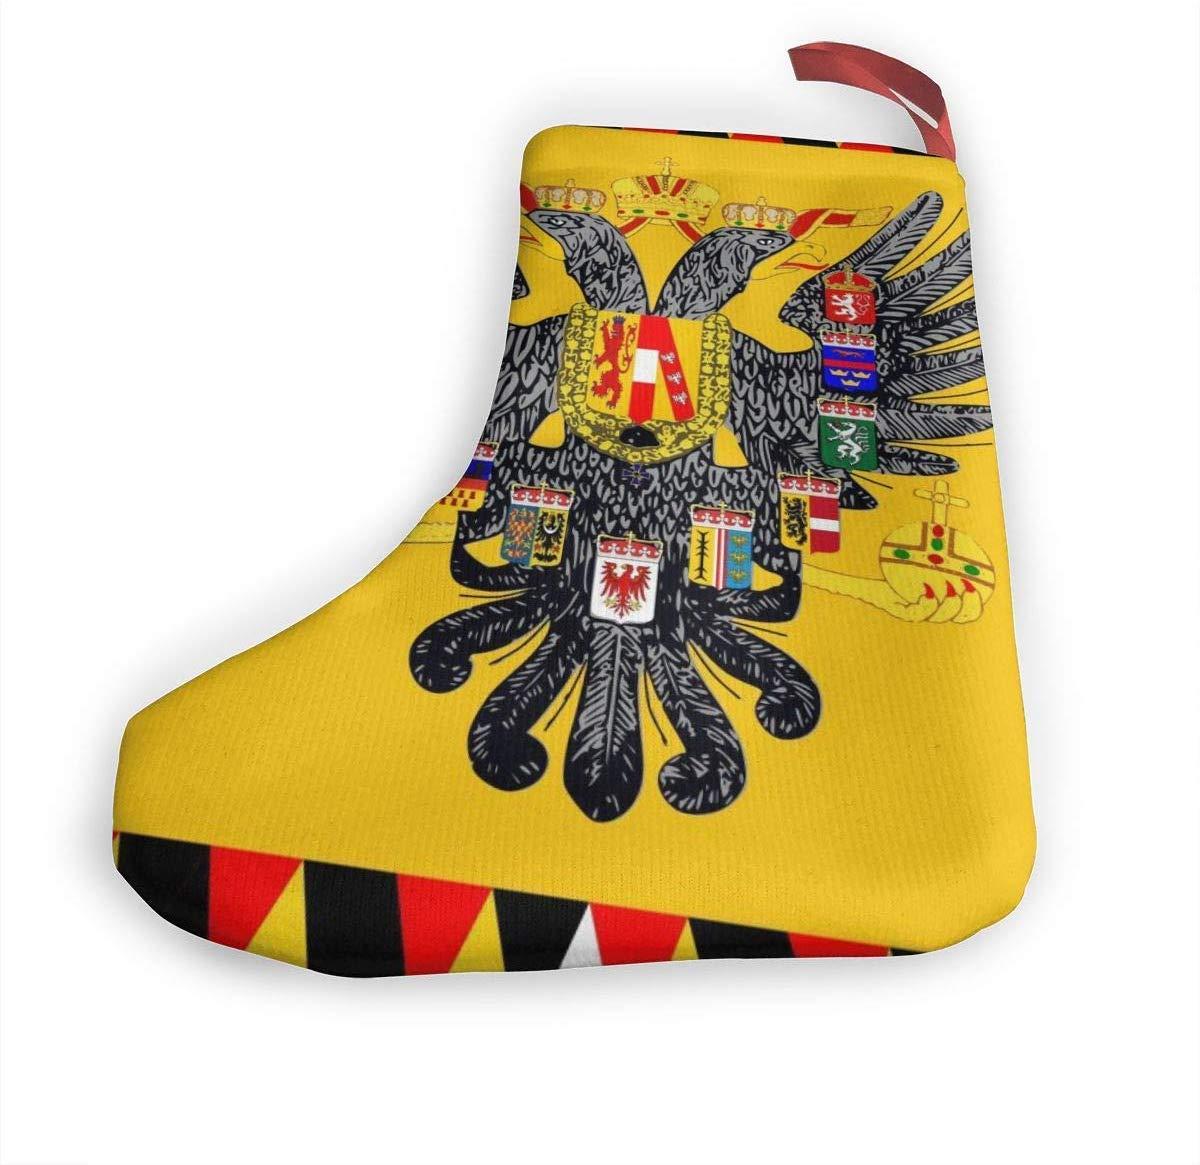 Azfaiop Christmas Stocking 10 Austro-Hungarian Empire Flag Hooked Xmas Stocking for Christmas